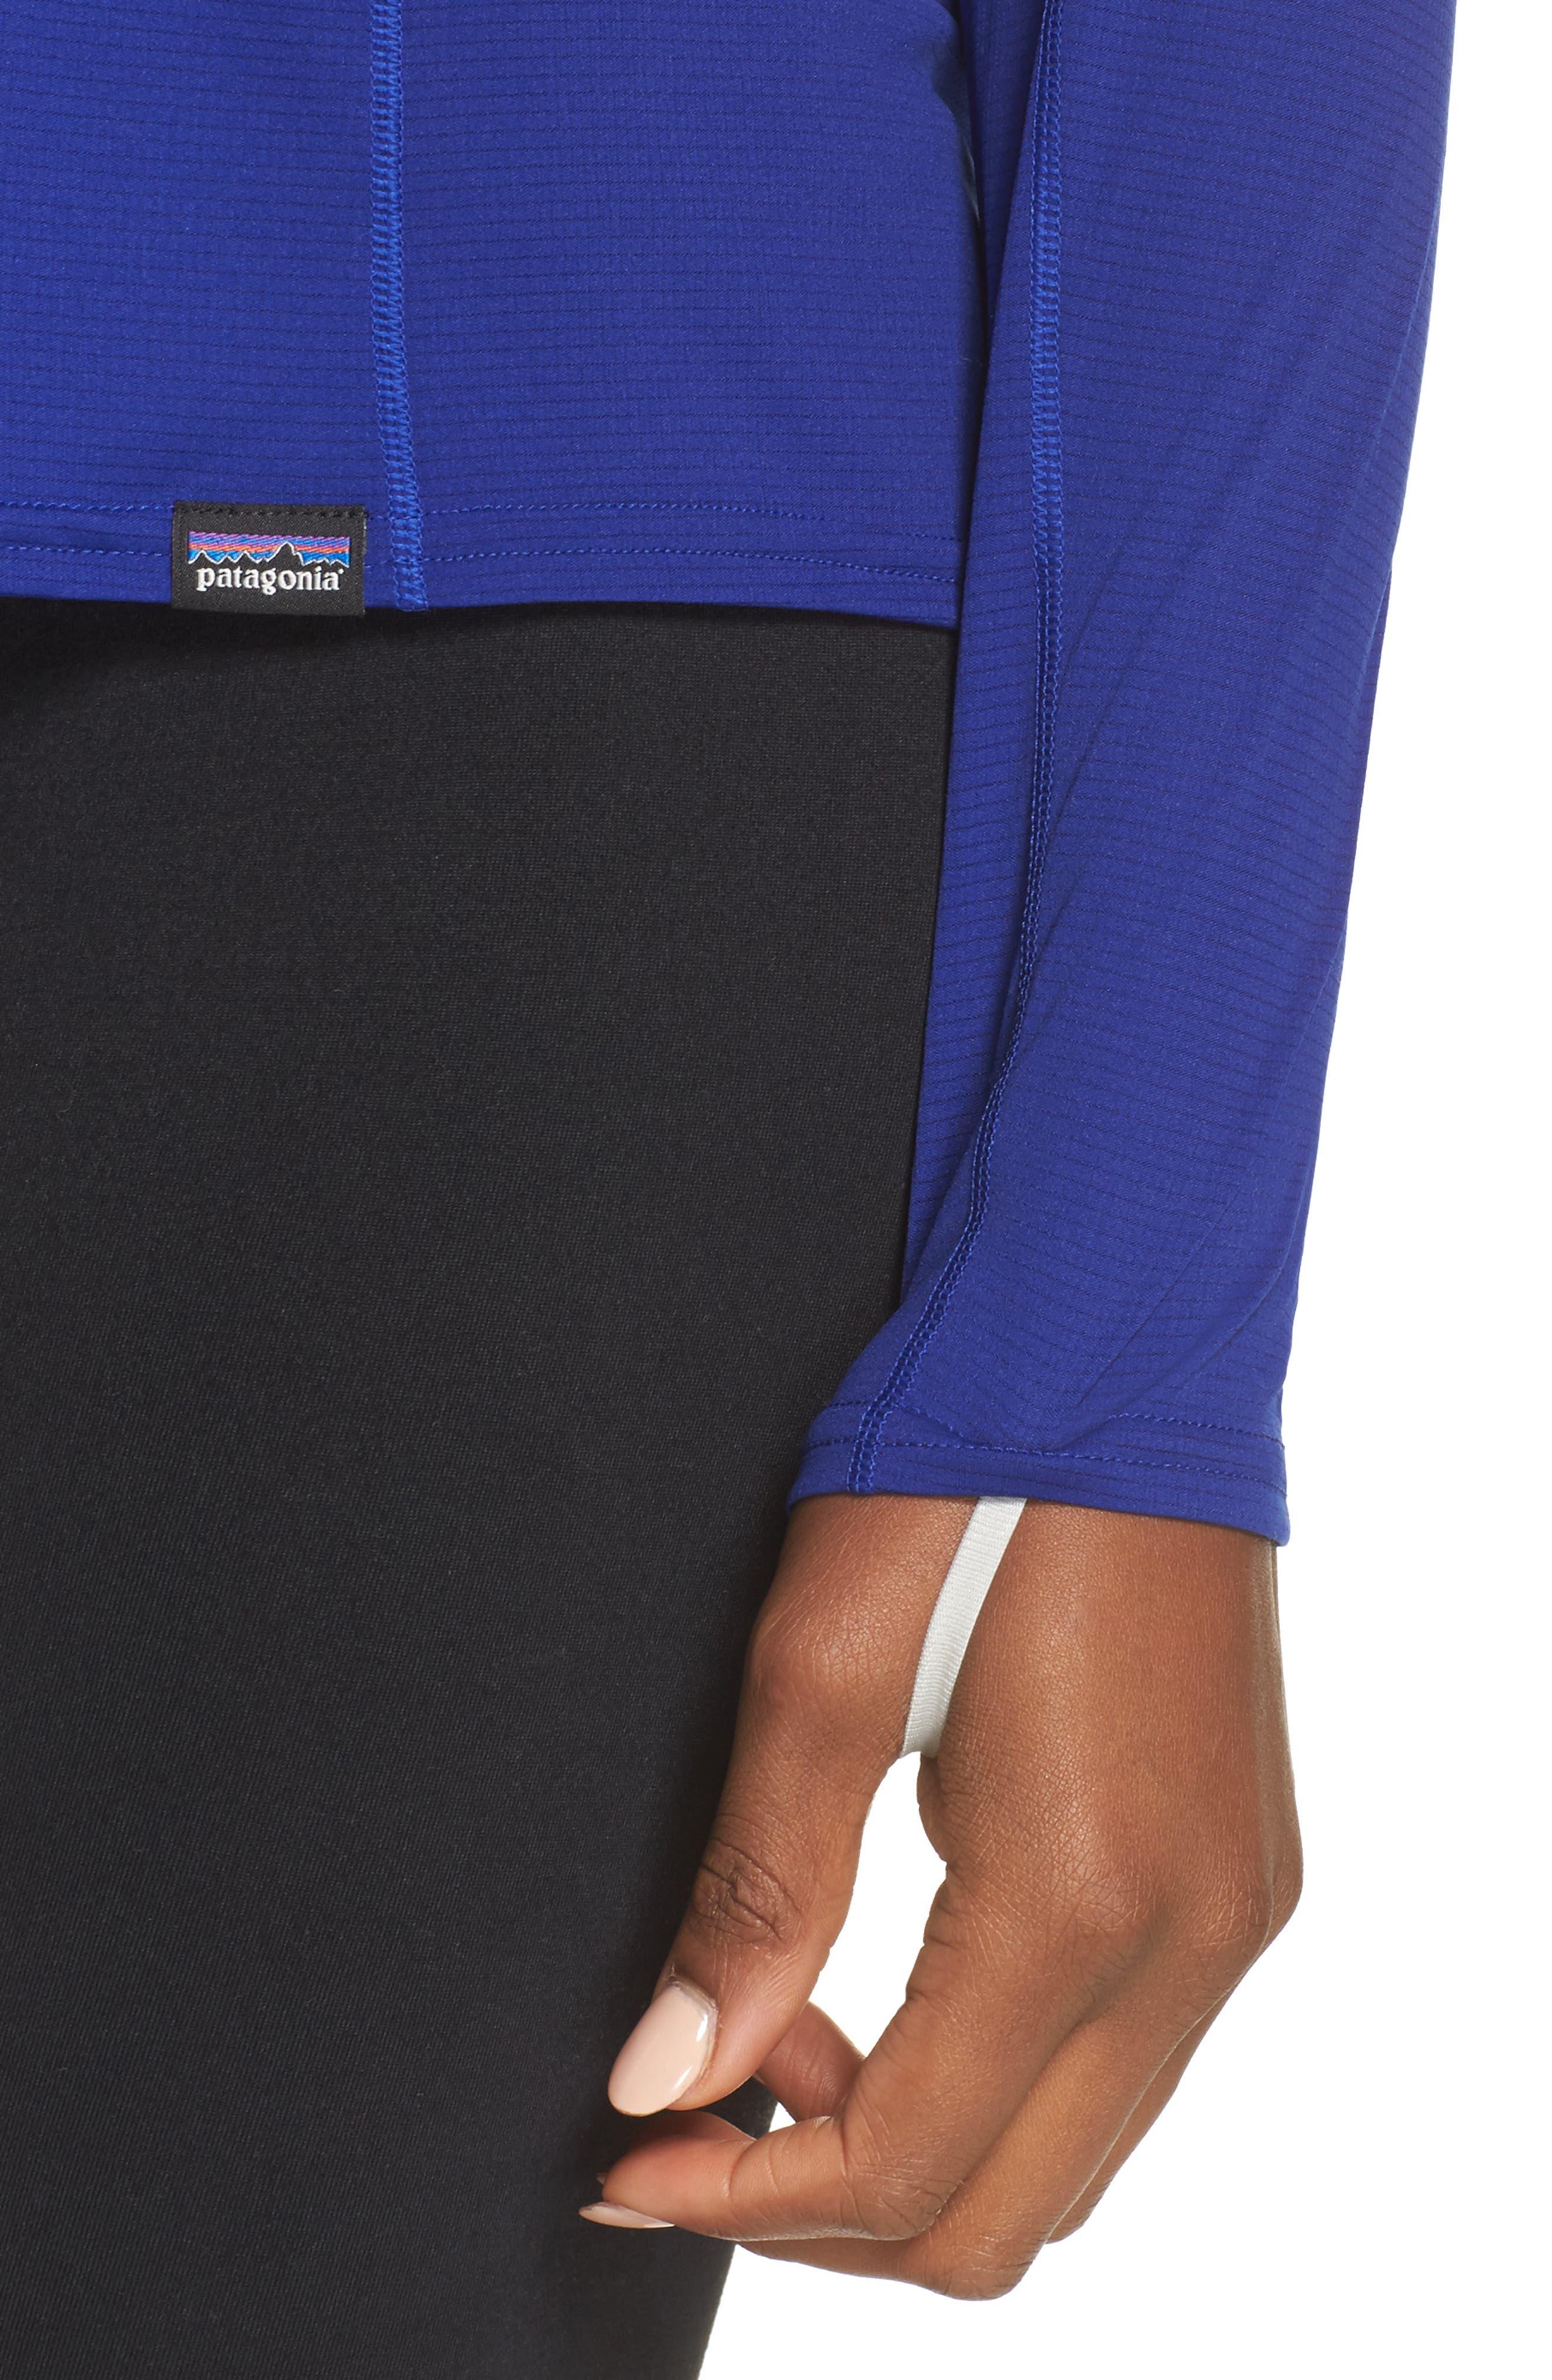 Lightweight Capilene<sup>®</sup> Long-Sleeve Tee,                             Alternate thumbnail 4, color,                             Cobalt Blue